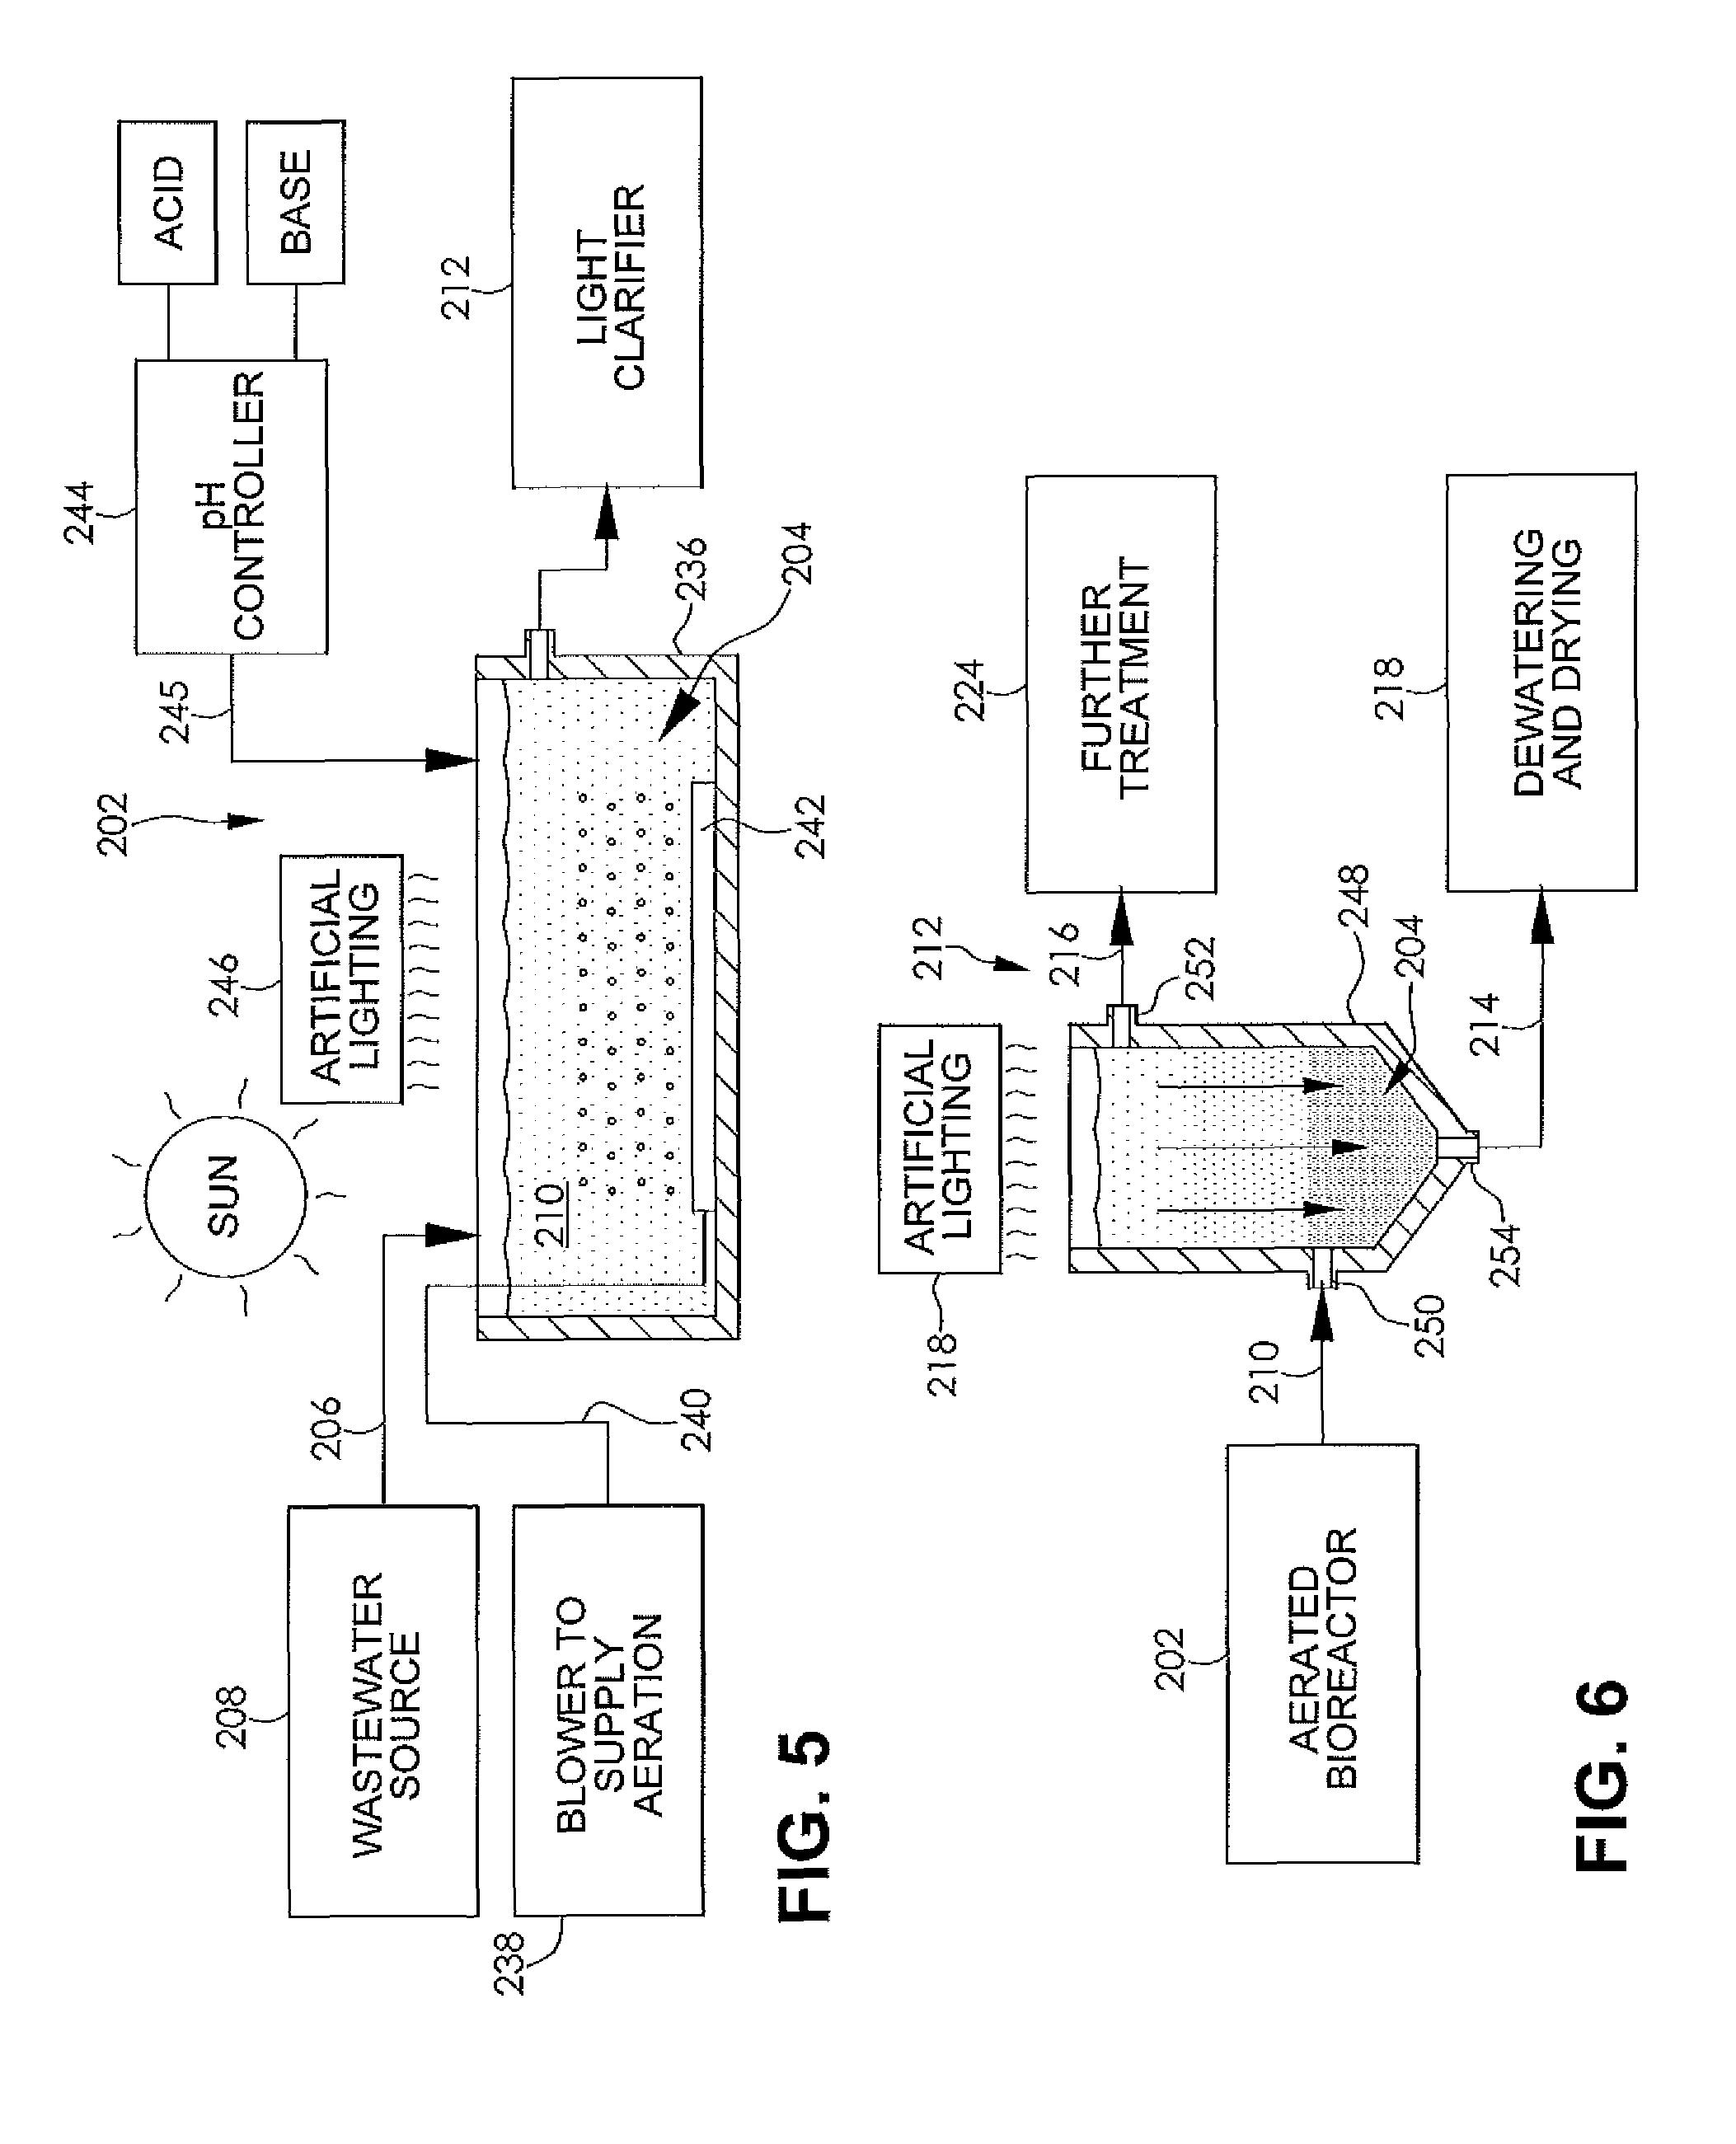 Yakult Process Flow Diagram Wiring Diagram